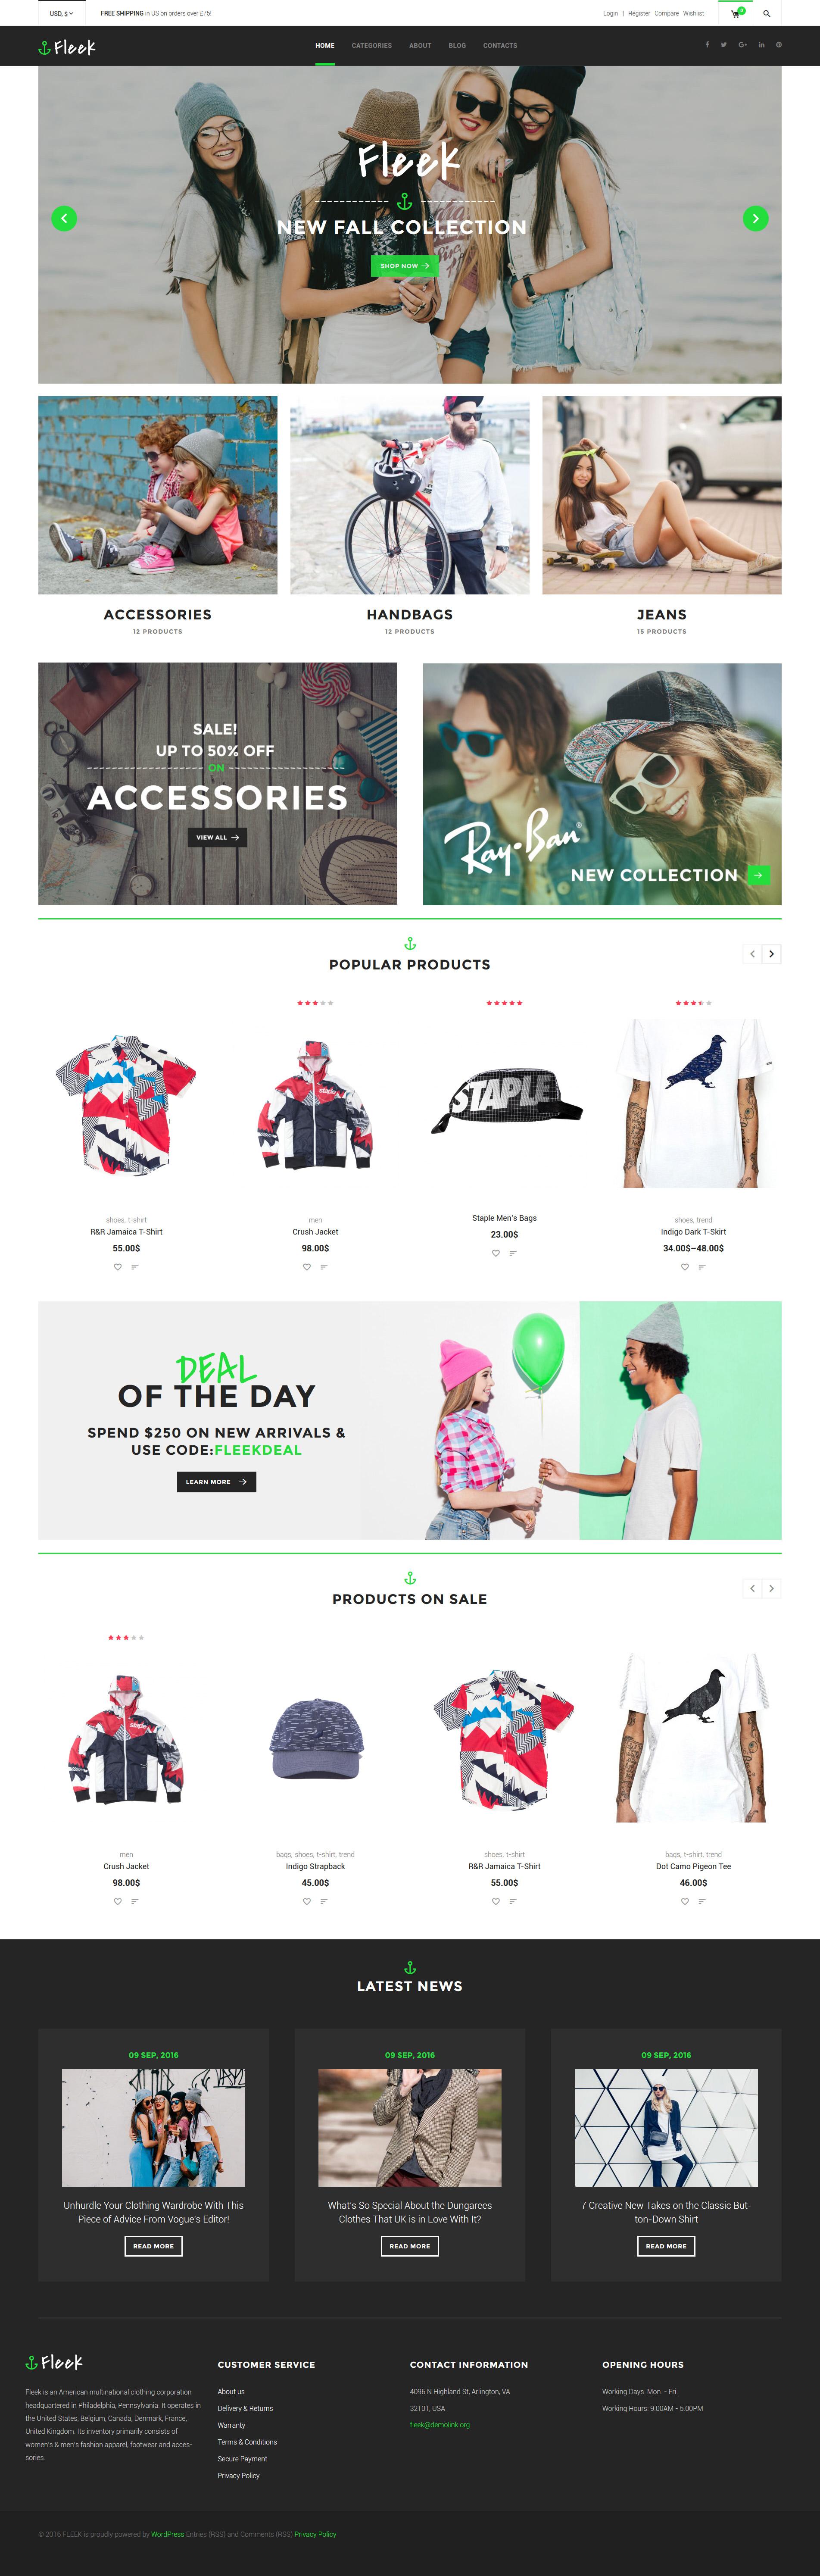 """Fleek - Urban Fashion Store"" thème WooCommerce adaptatif #60095 - screenshot"